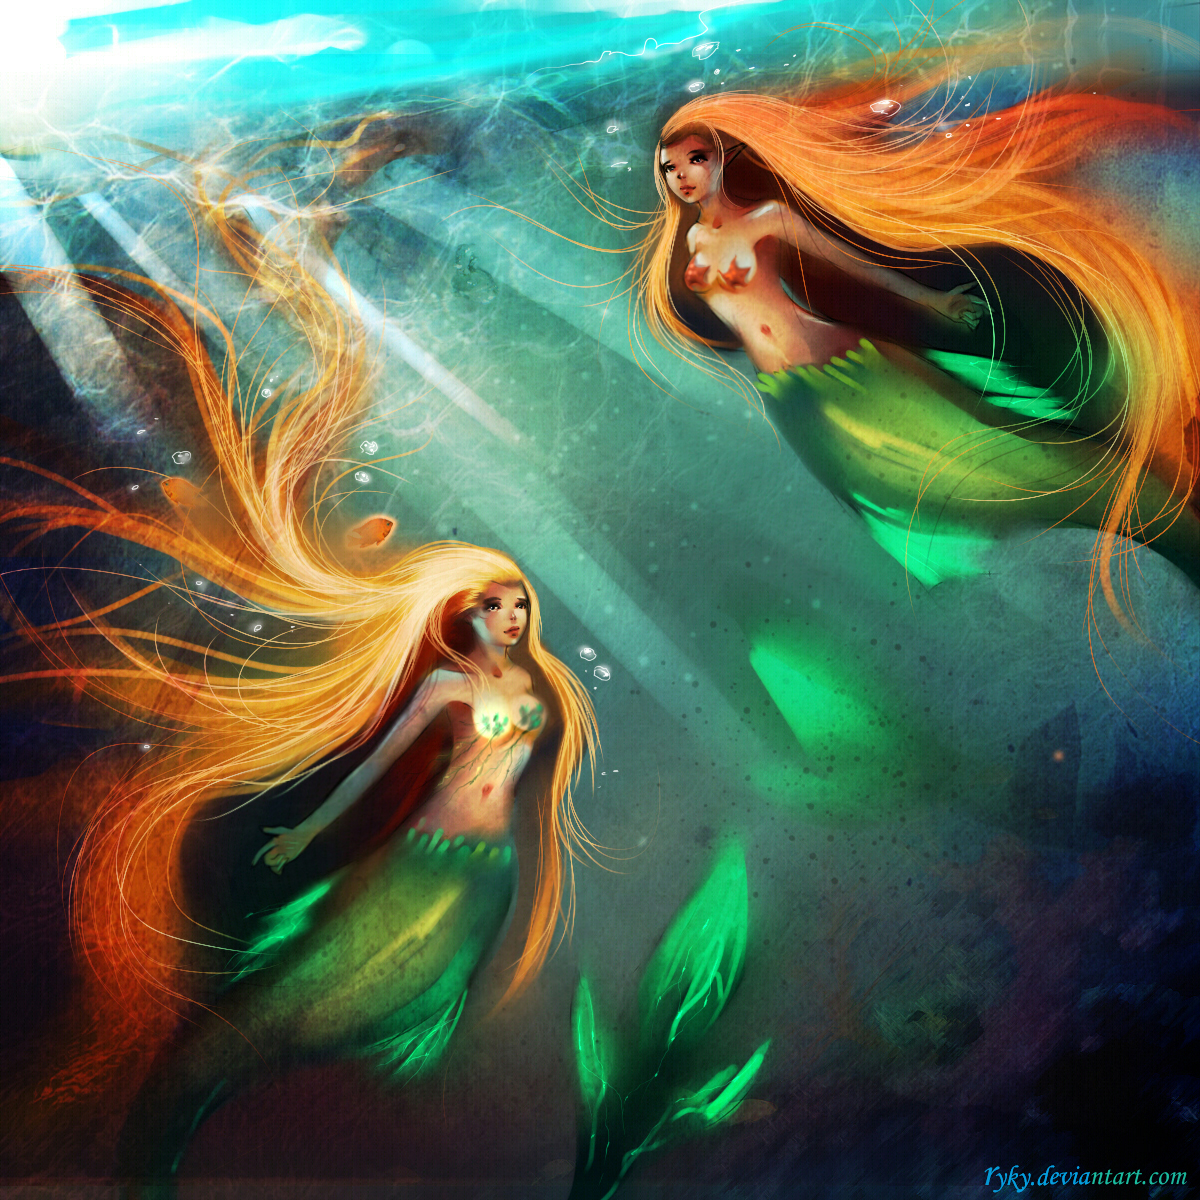 Twins mermaids by ryky